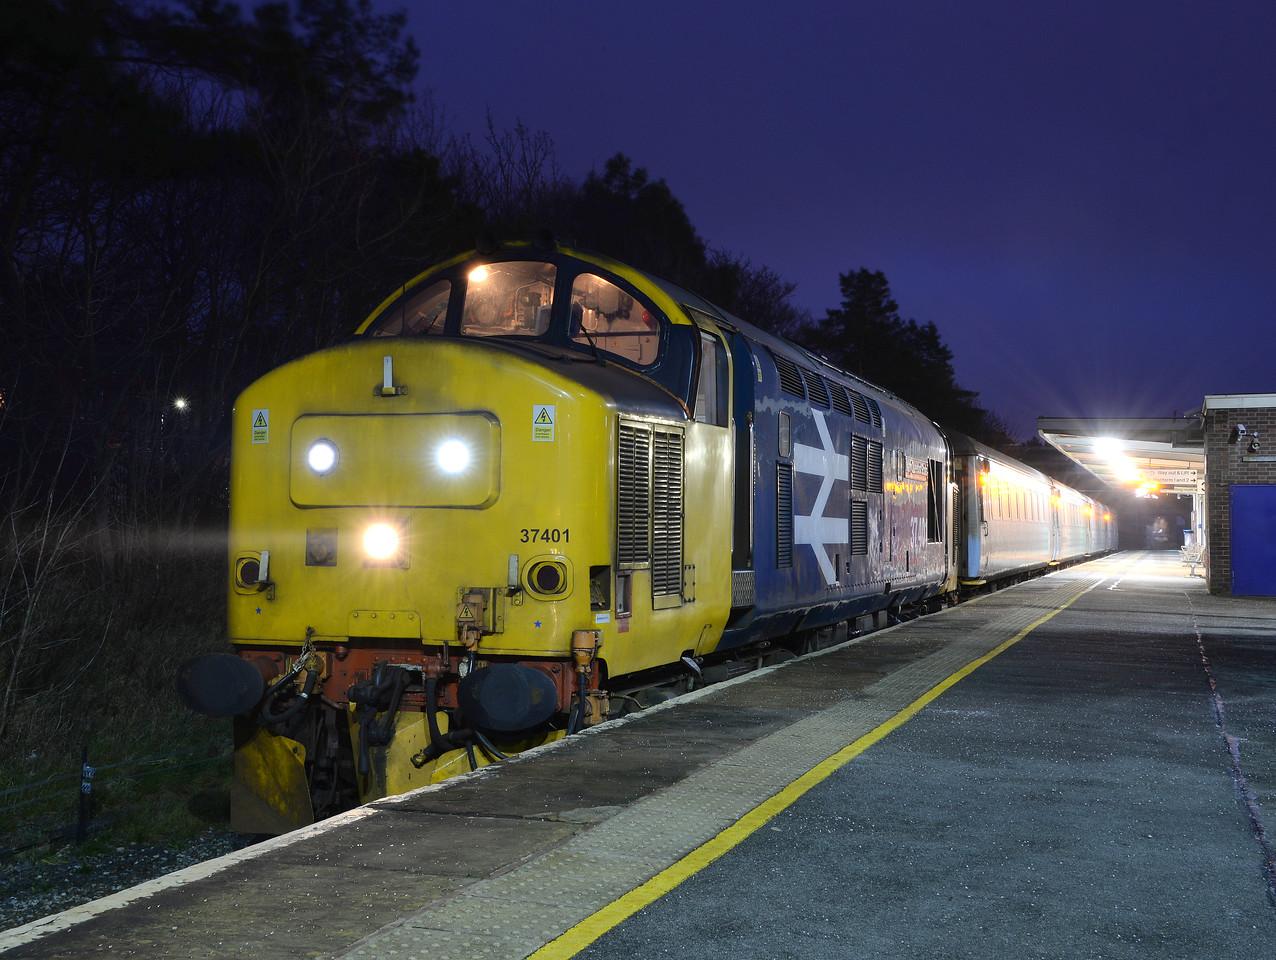 37401, Barrow in Furness. 26/01/17.